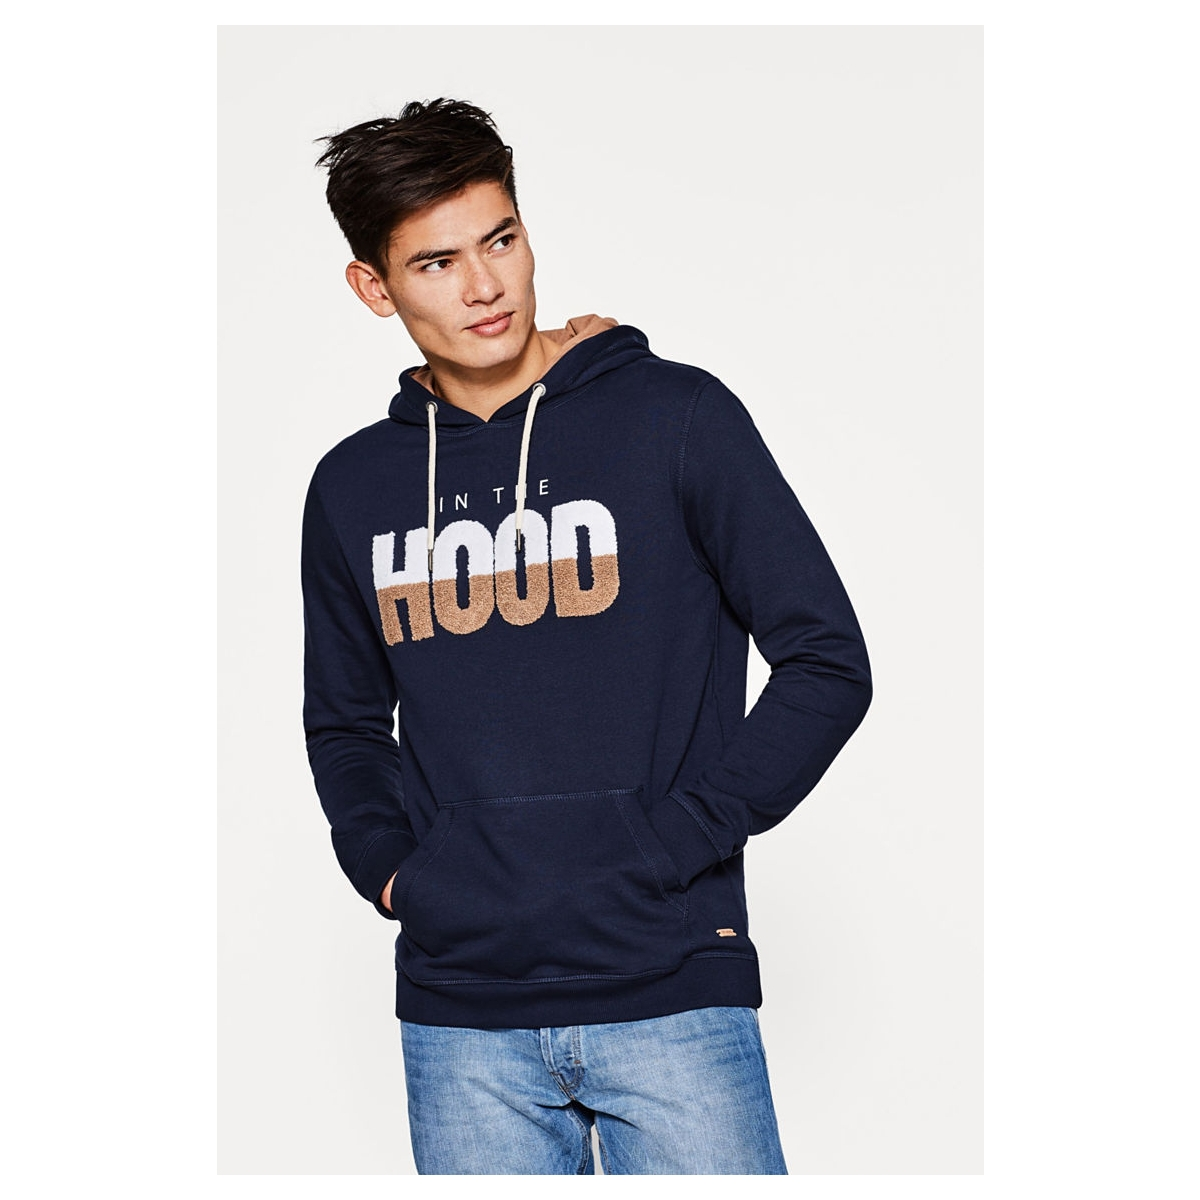 127cc2j005 edc sweater c400